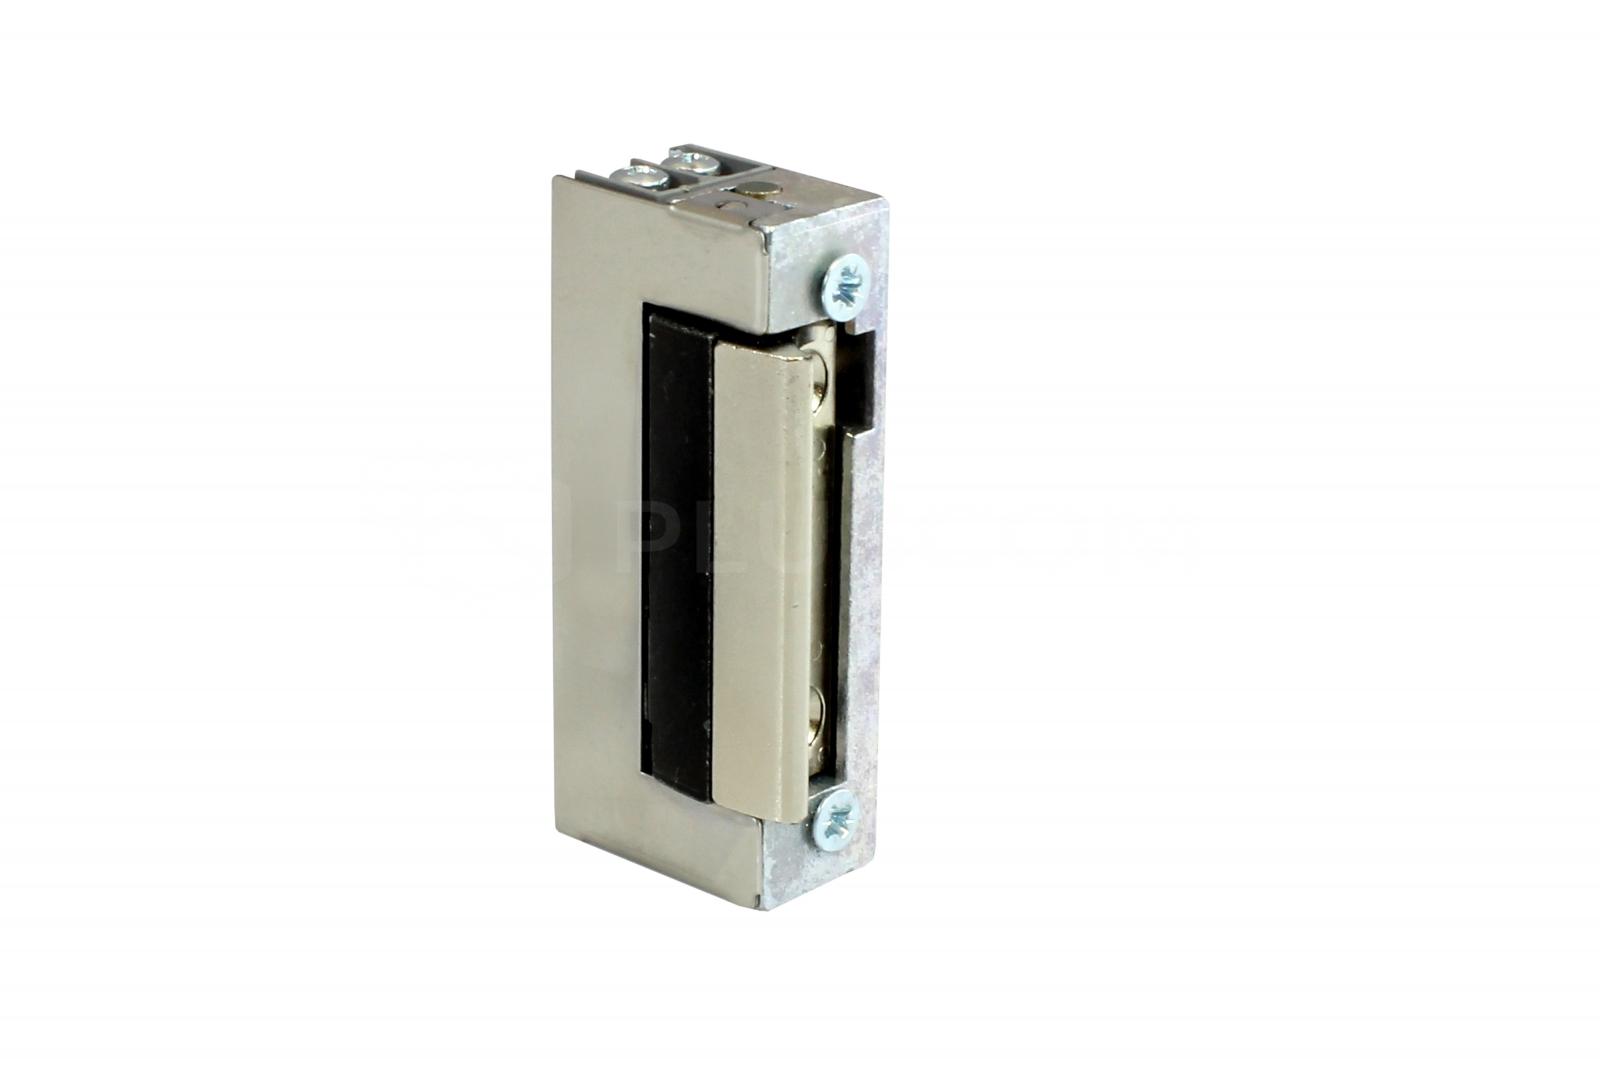 JiS 1410 12V AC/DC Electric latch releases